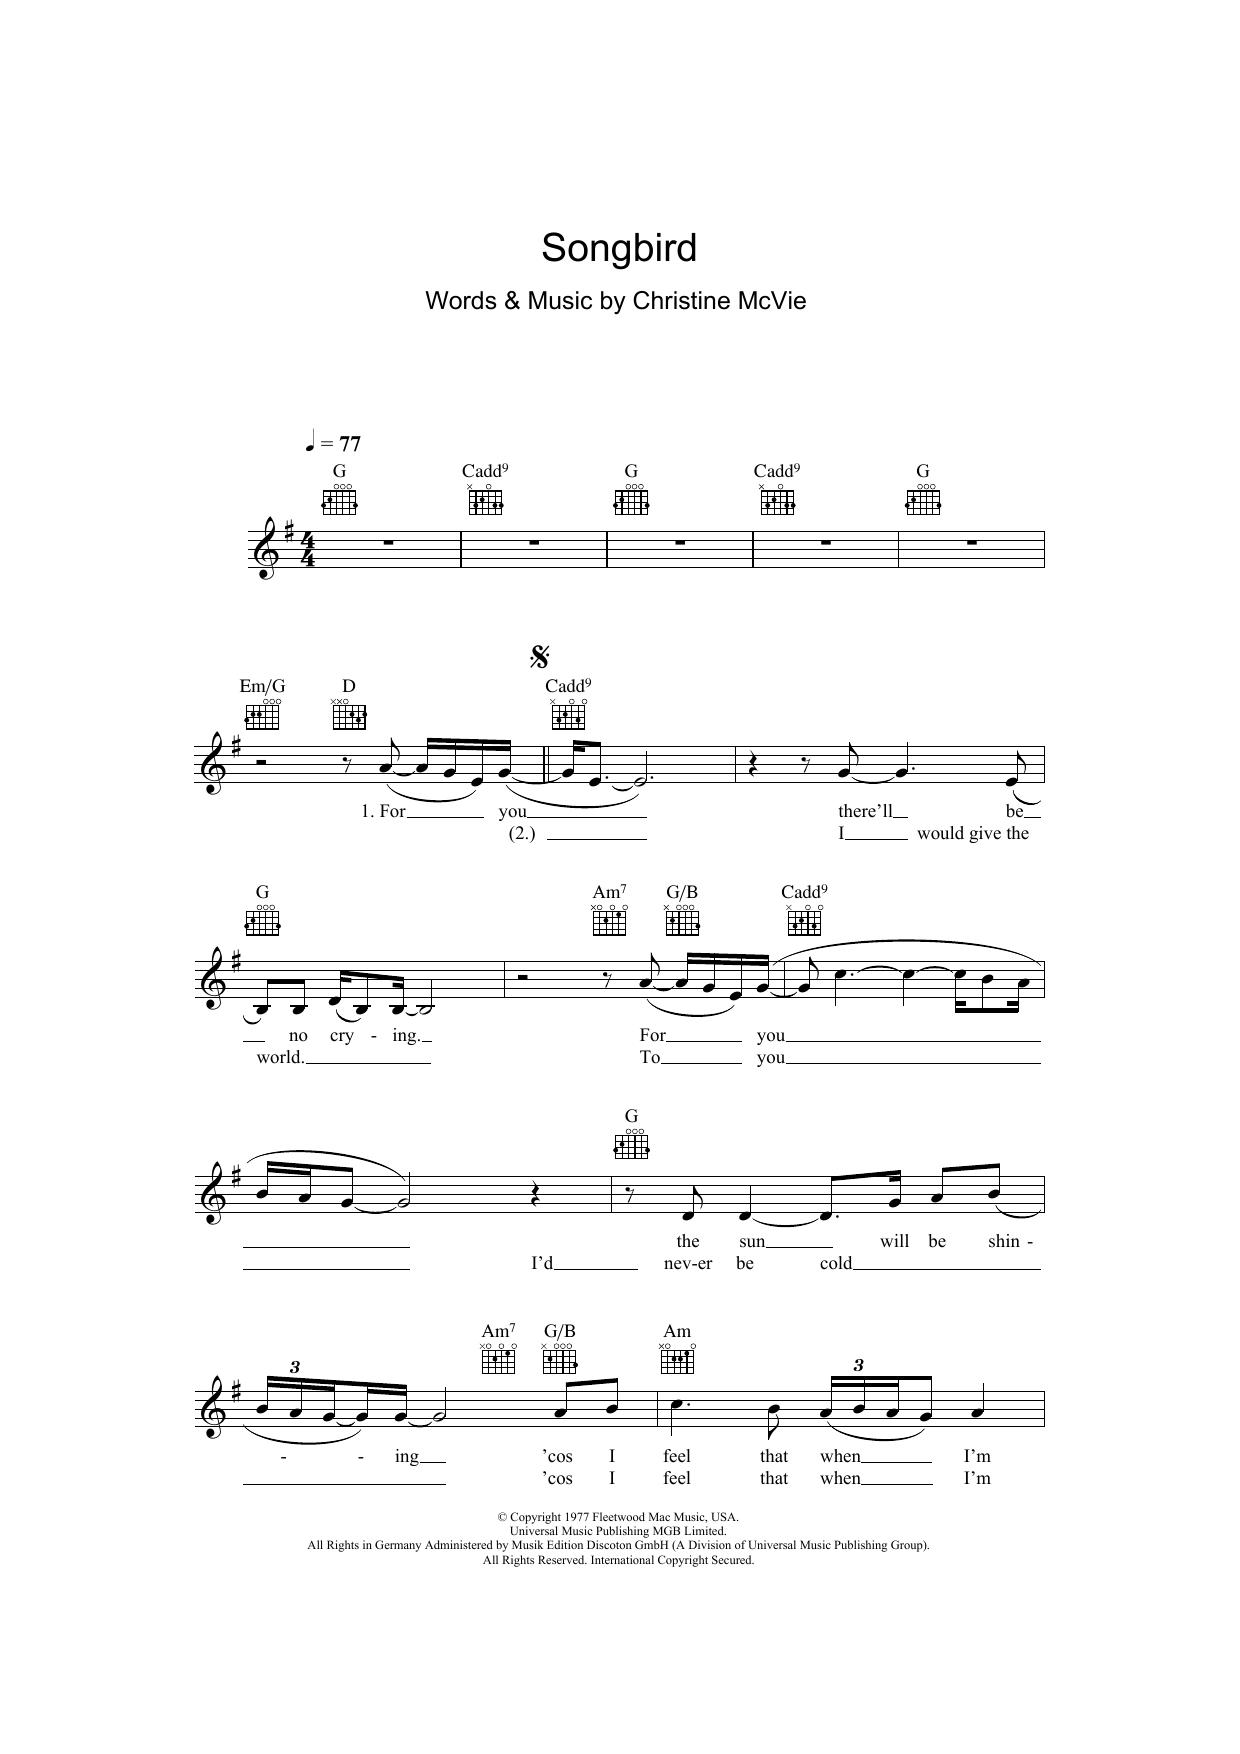 Songbird Sheet Music Eva Cassidy Melody Line Lyrics Chords